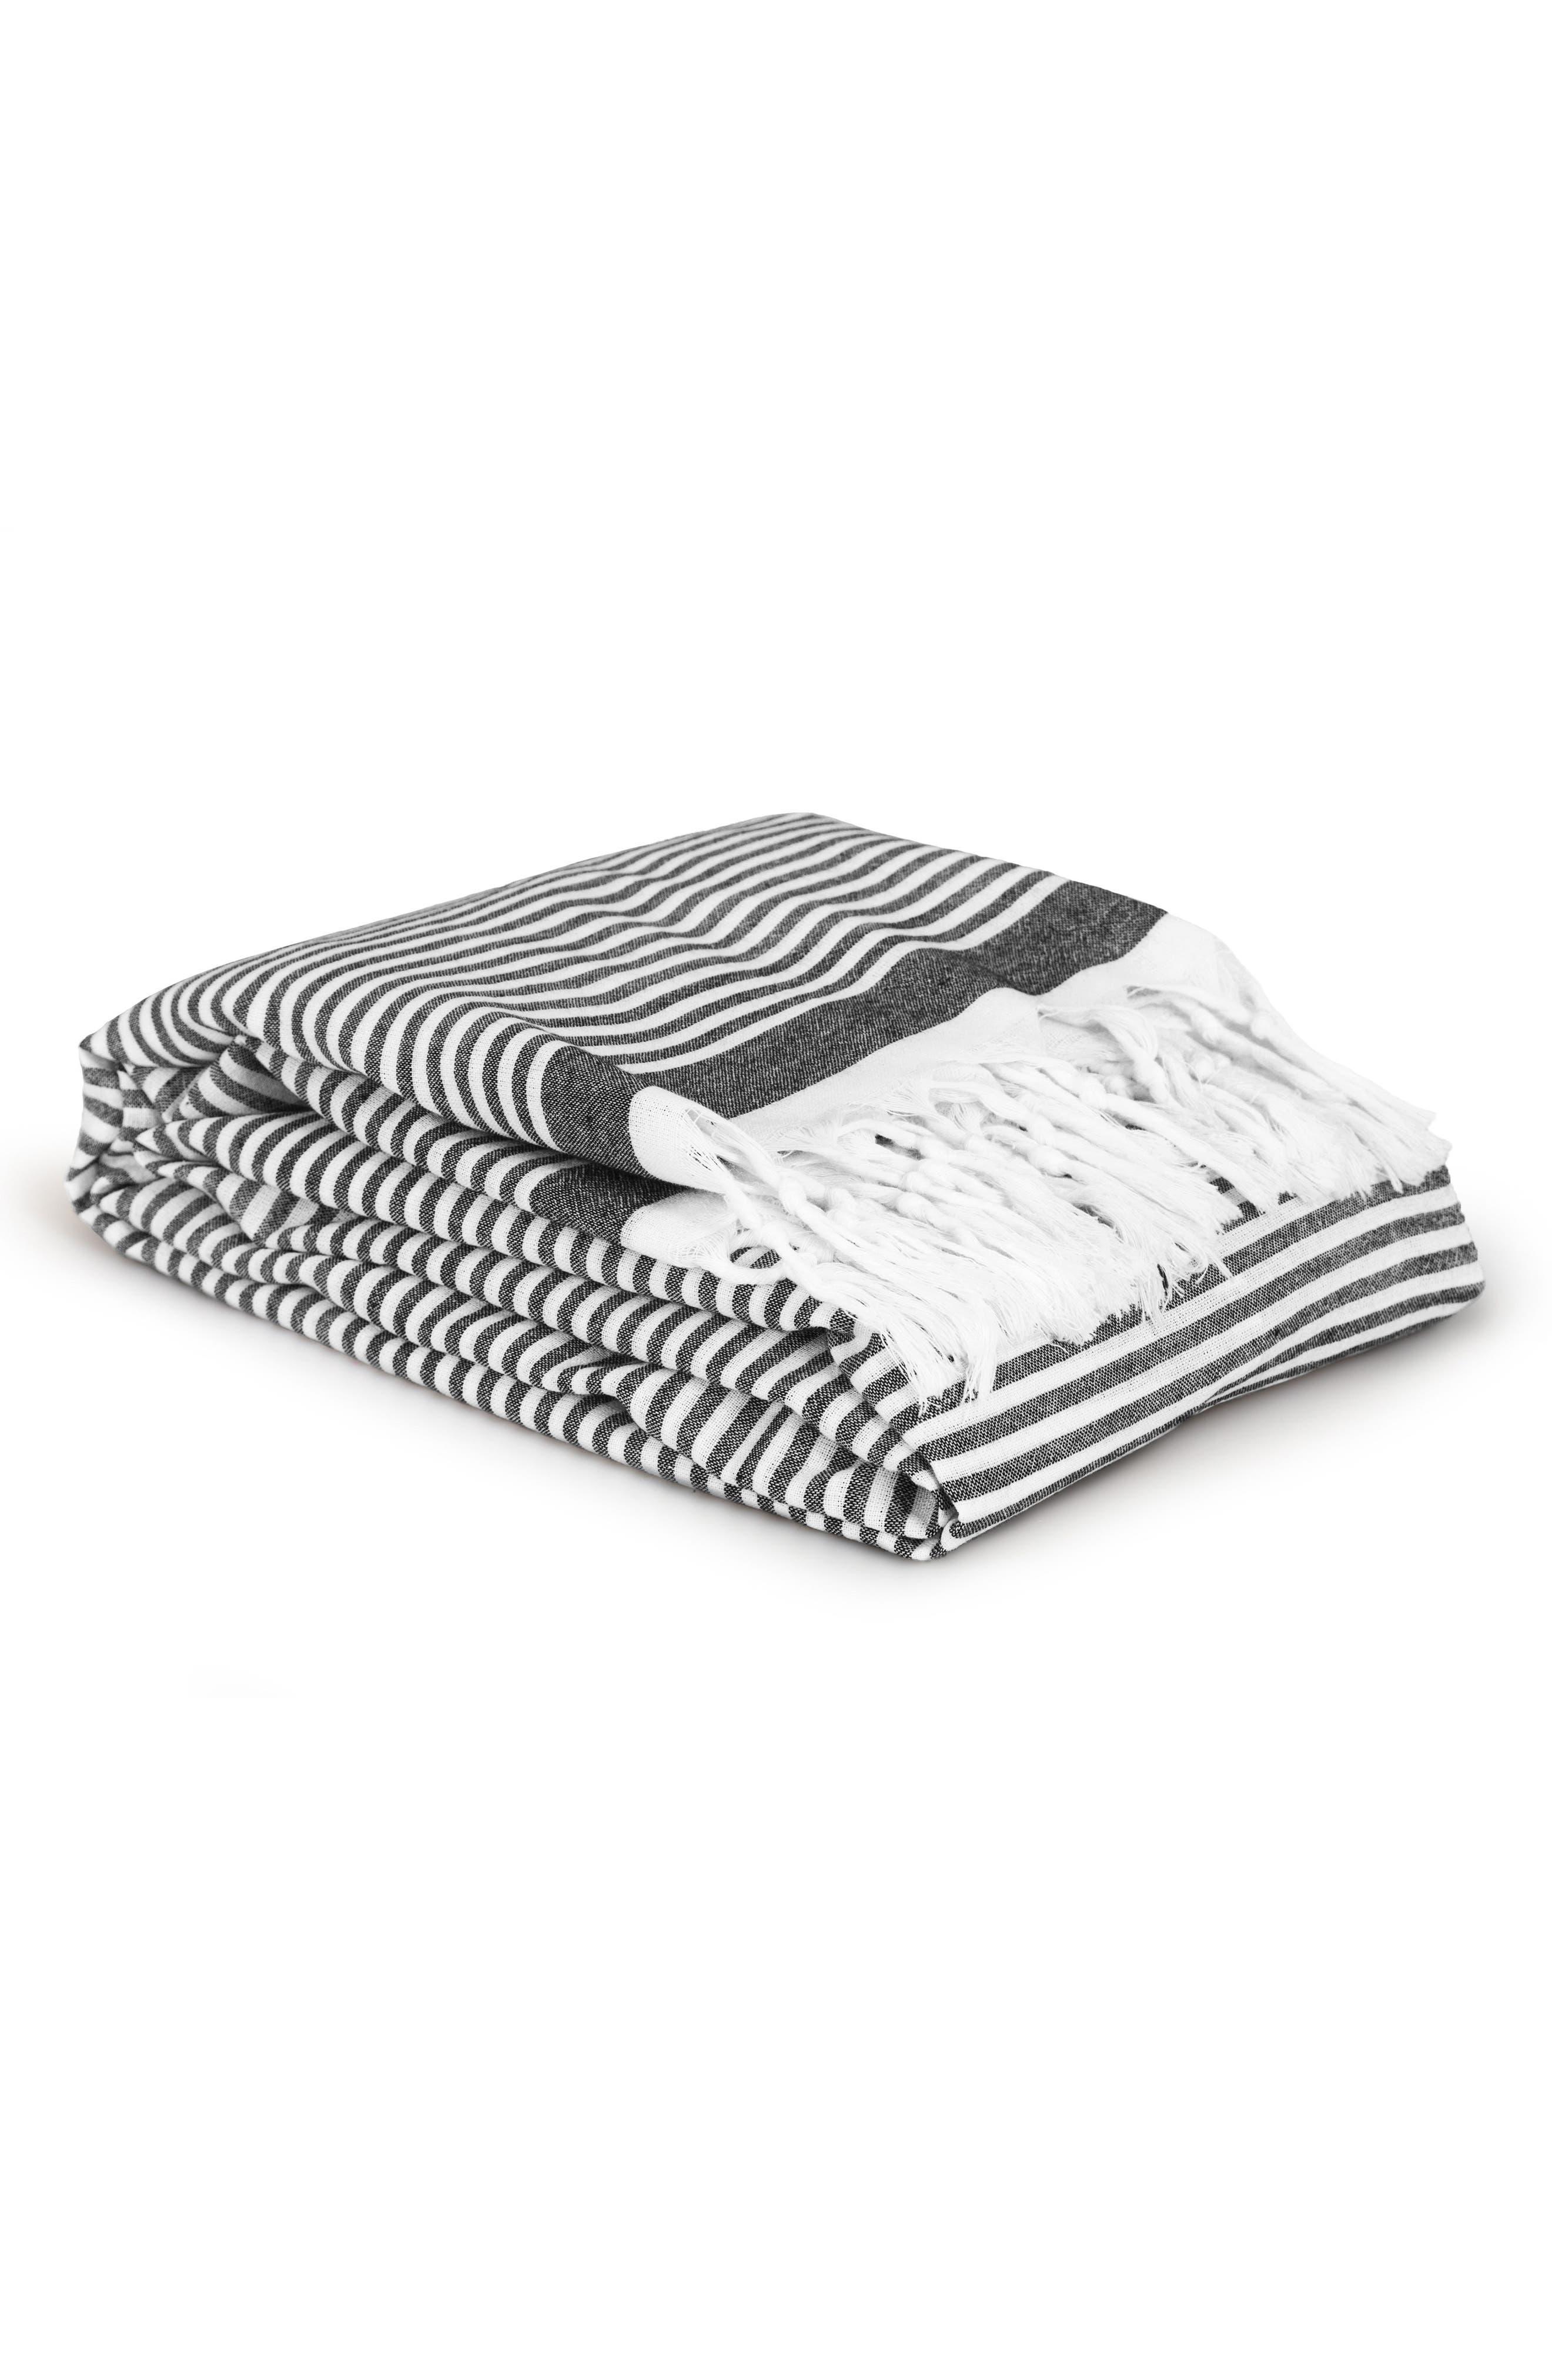 Soft Stripes Turkish Pestemal Towel,                             Alternate thumbnail 4, color,                             BLACK